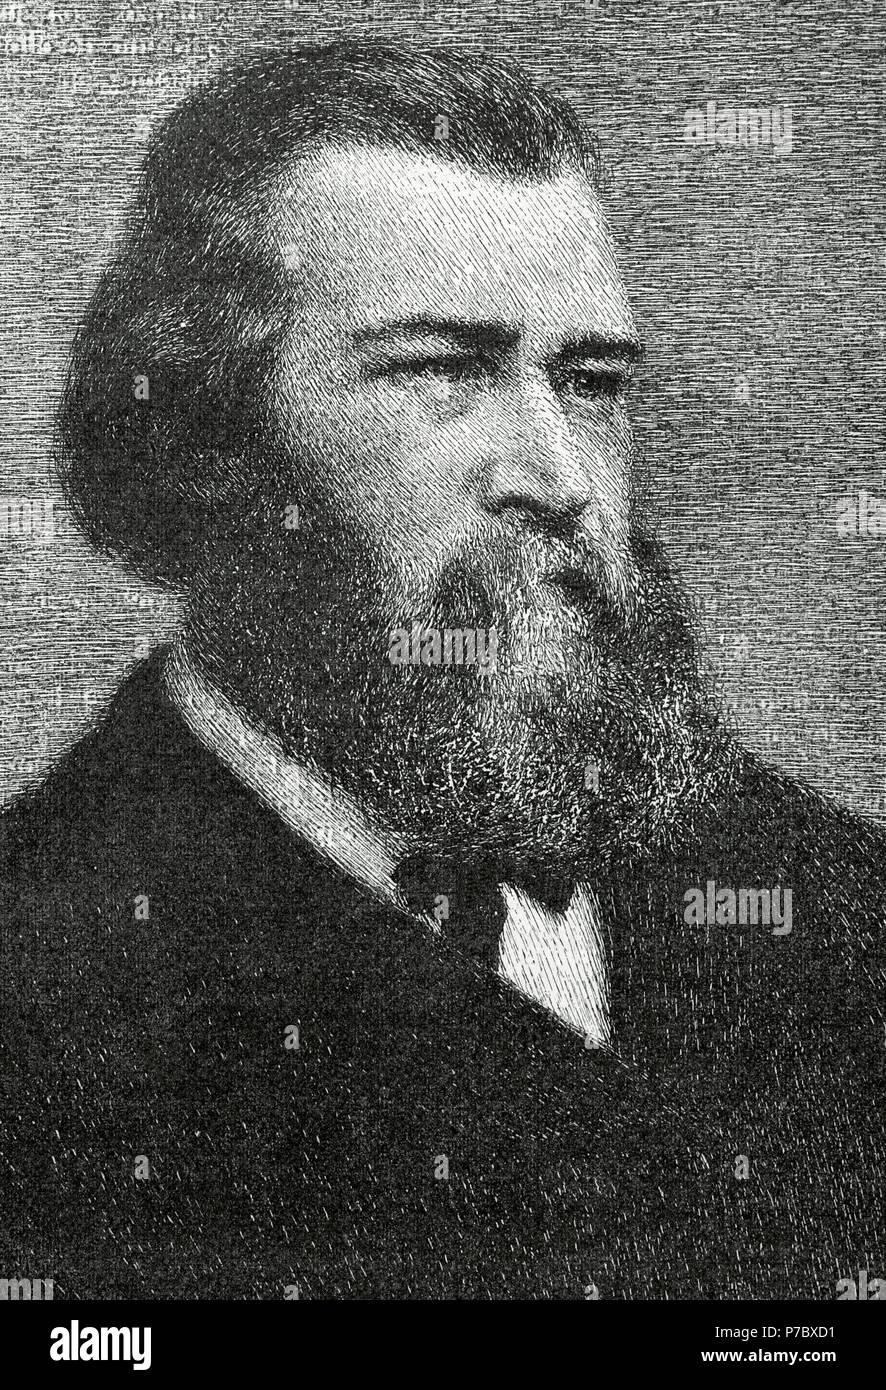 Jean-Franc_ois Millet (1814-1875). French painter. One of the founders of the Barbizon school. Portrait. Engraving. El Mundo Ilustrado, 1880. - Stock Image